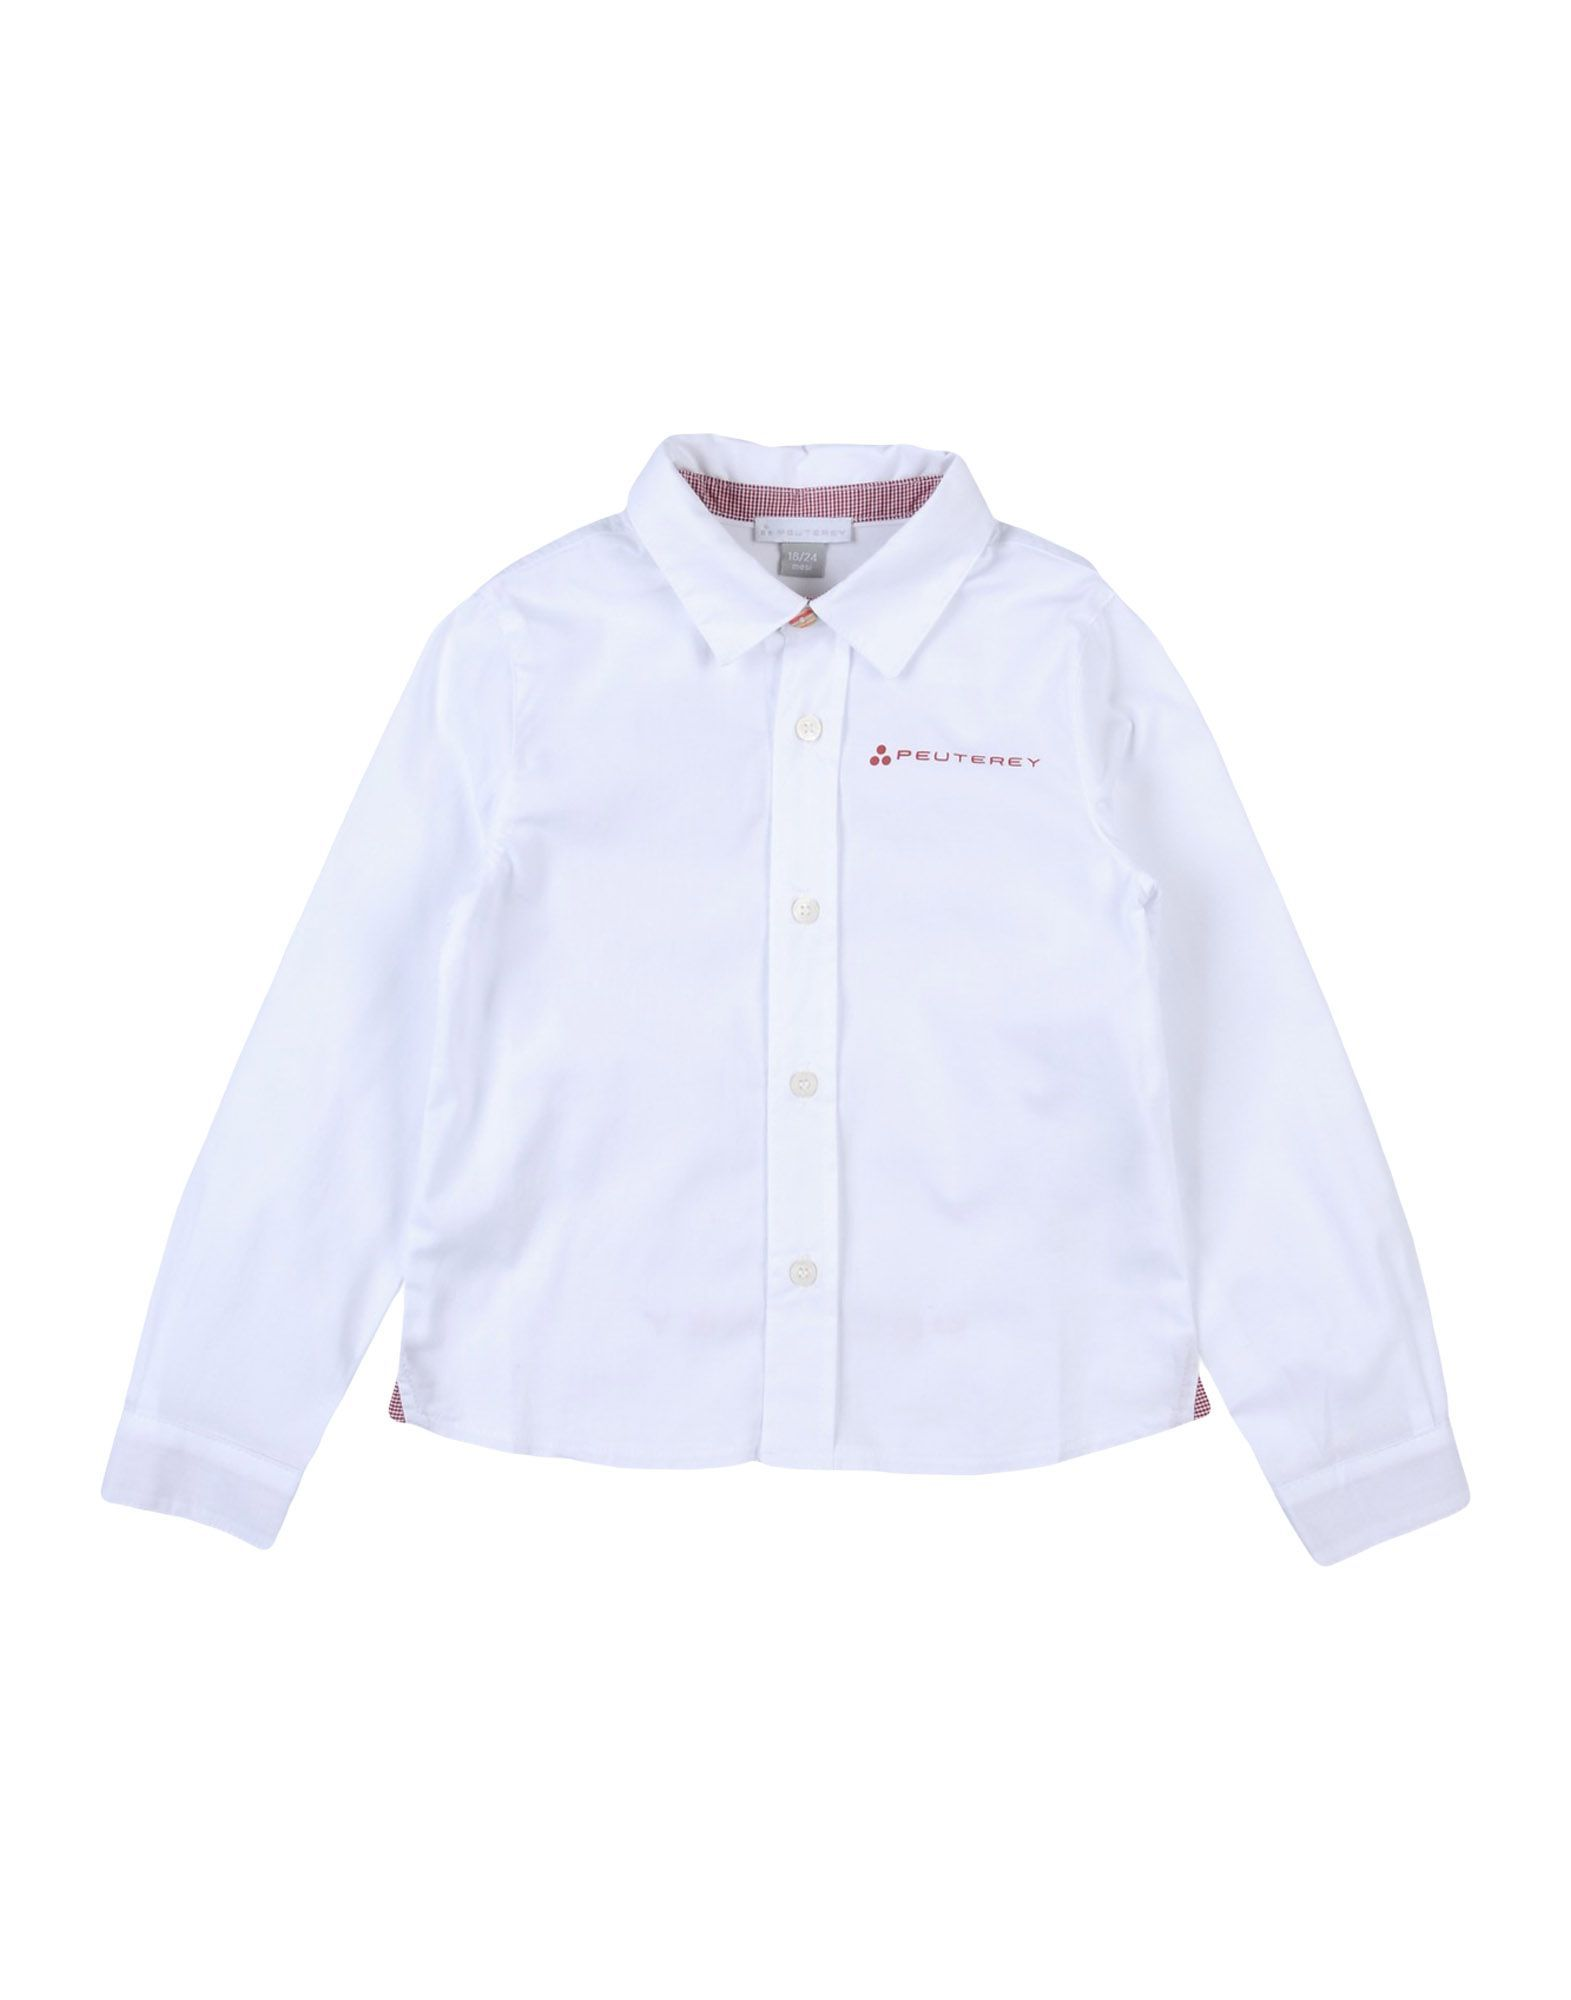 SHIRTS Boy Peuterey White Cotton